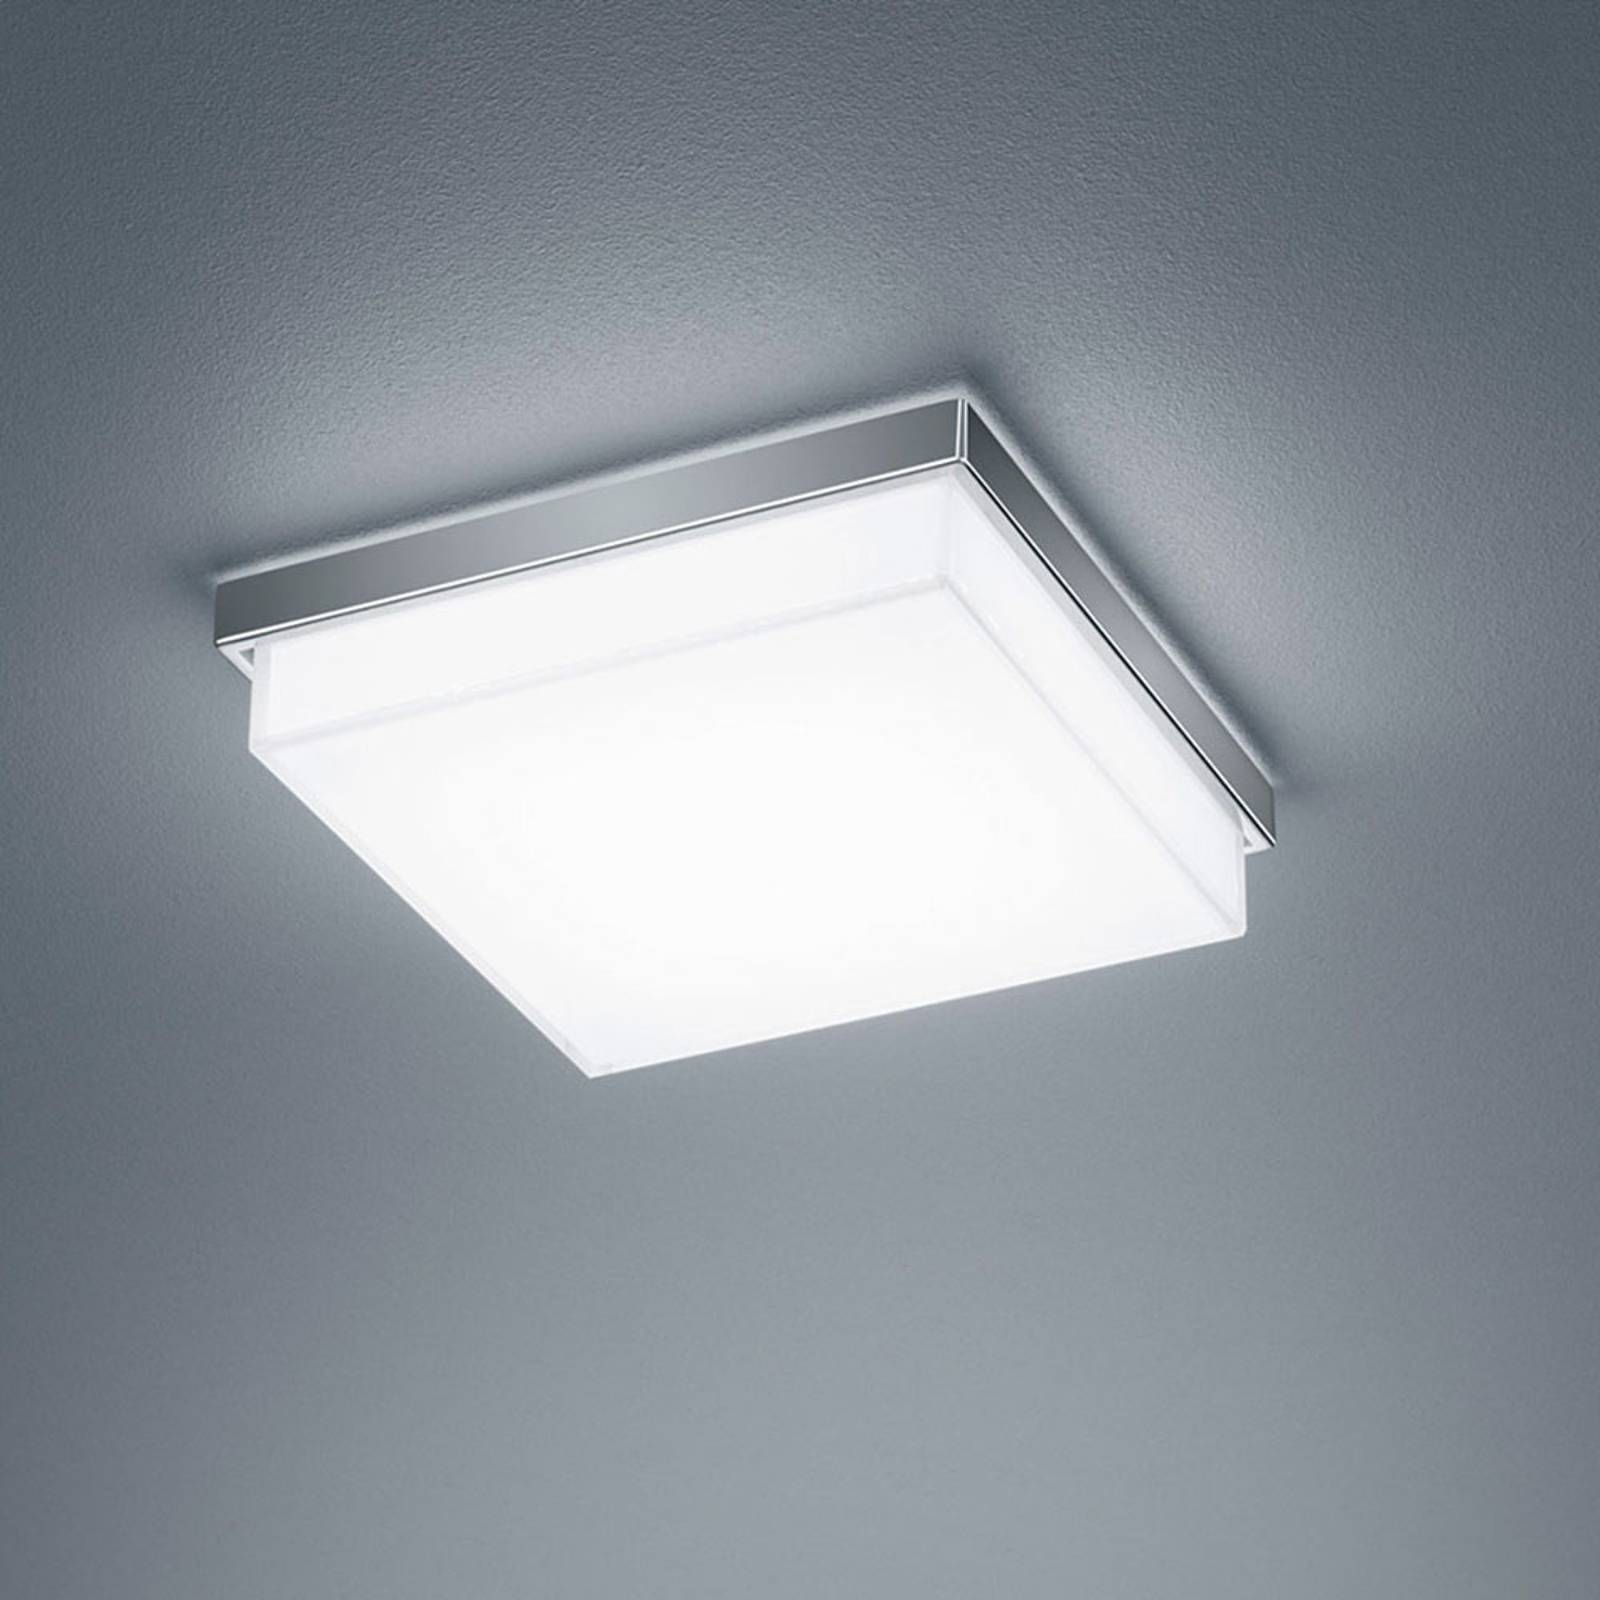 Helestra Cosi -LED-kattovalaisin, kromi 21x21 cm